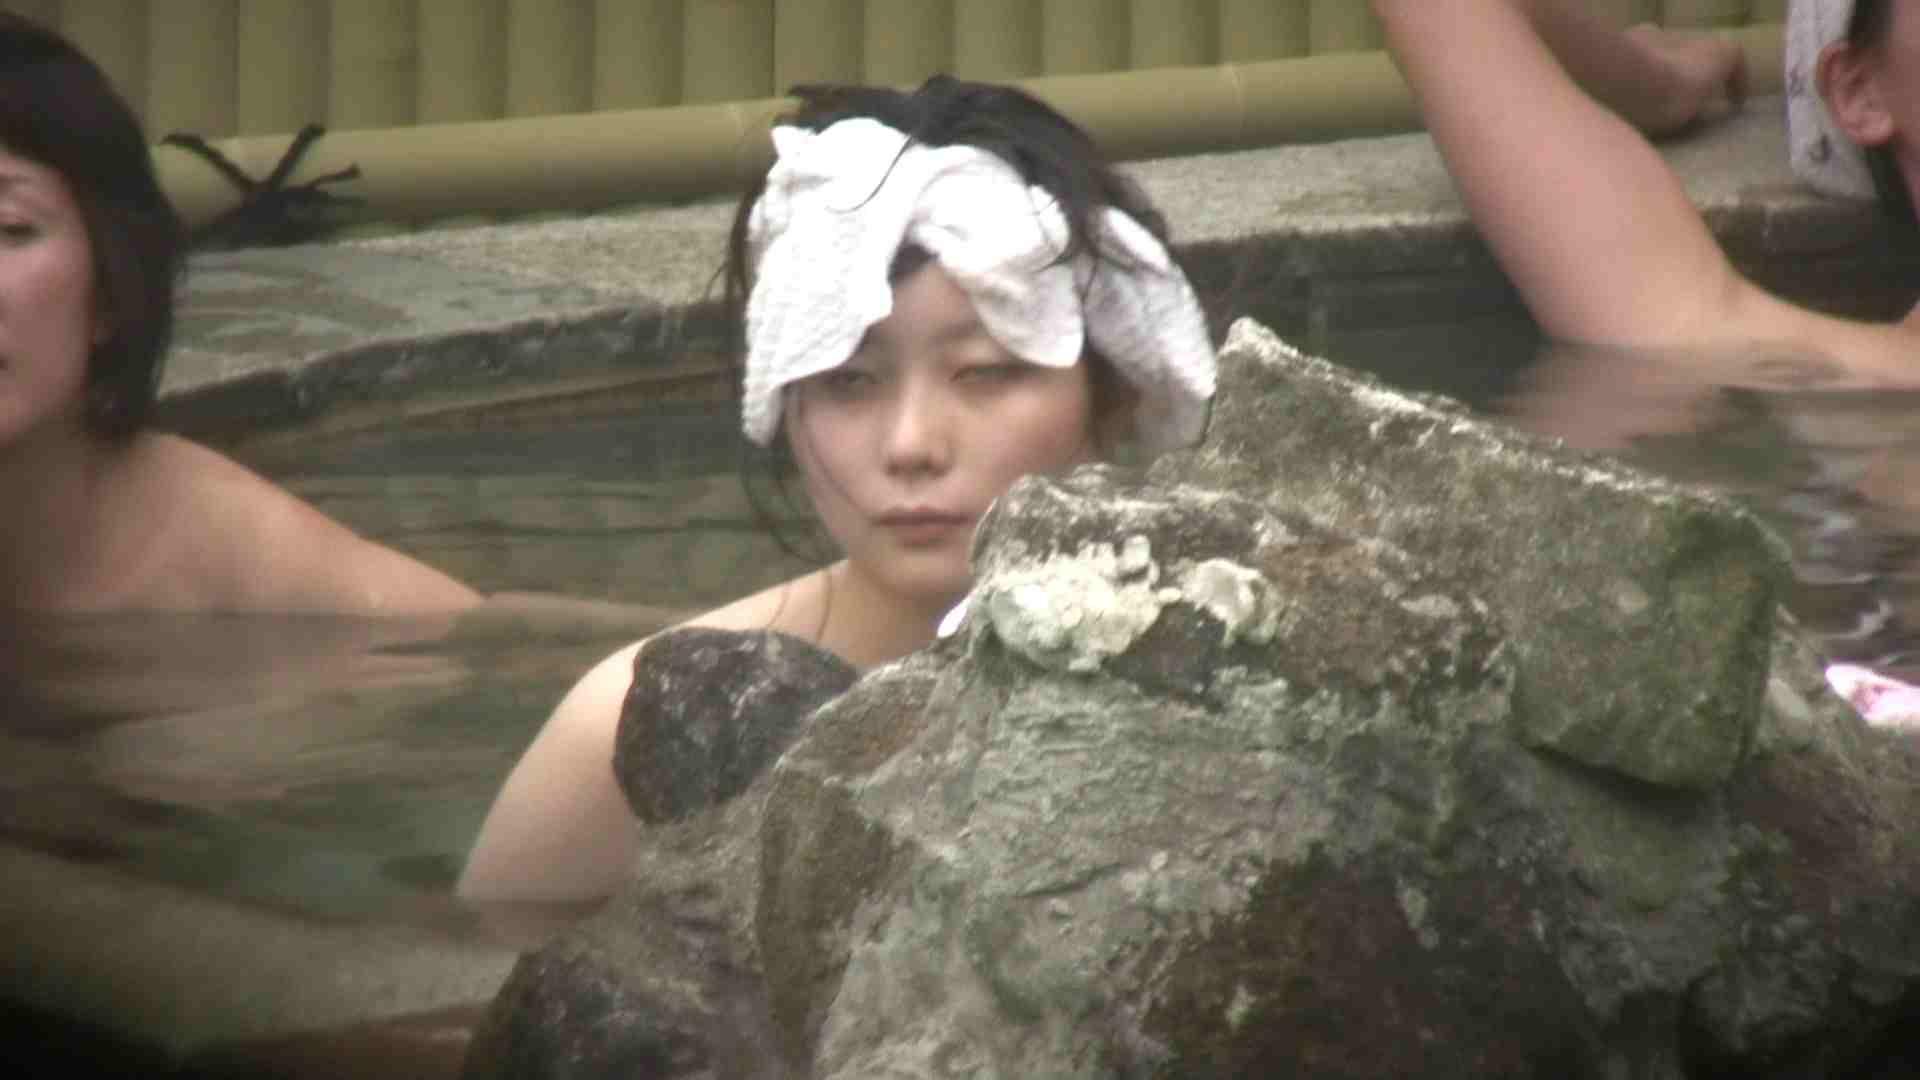 Aquaな露天風呂Vol.147 盗撮 | OLセックス  85画像 1